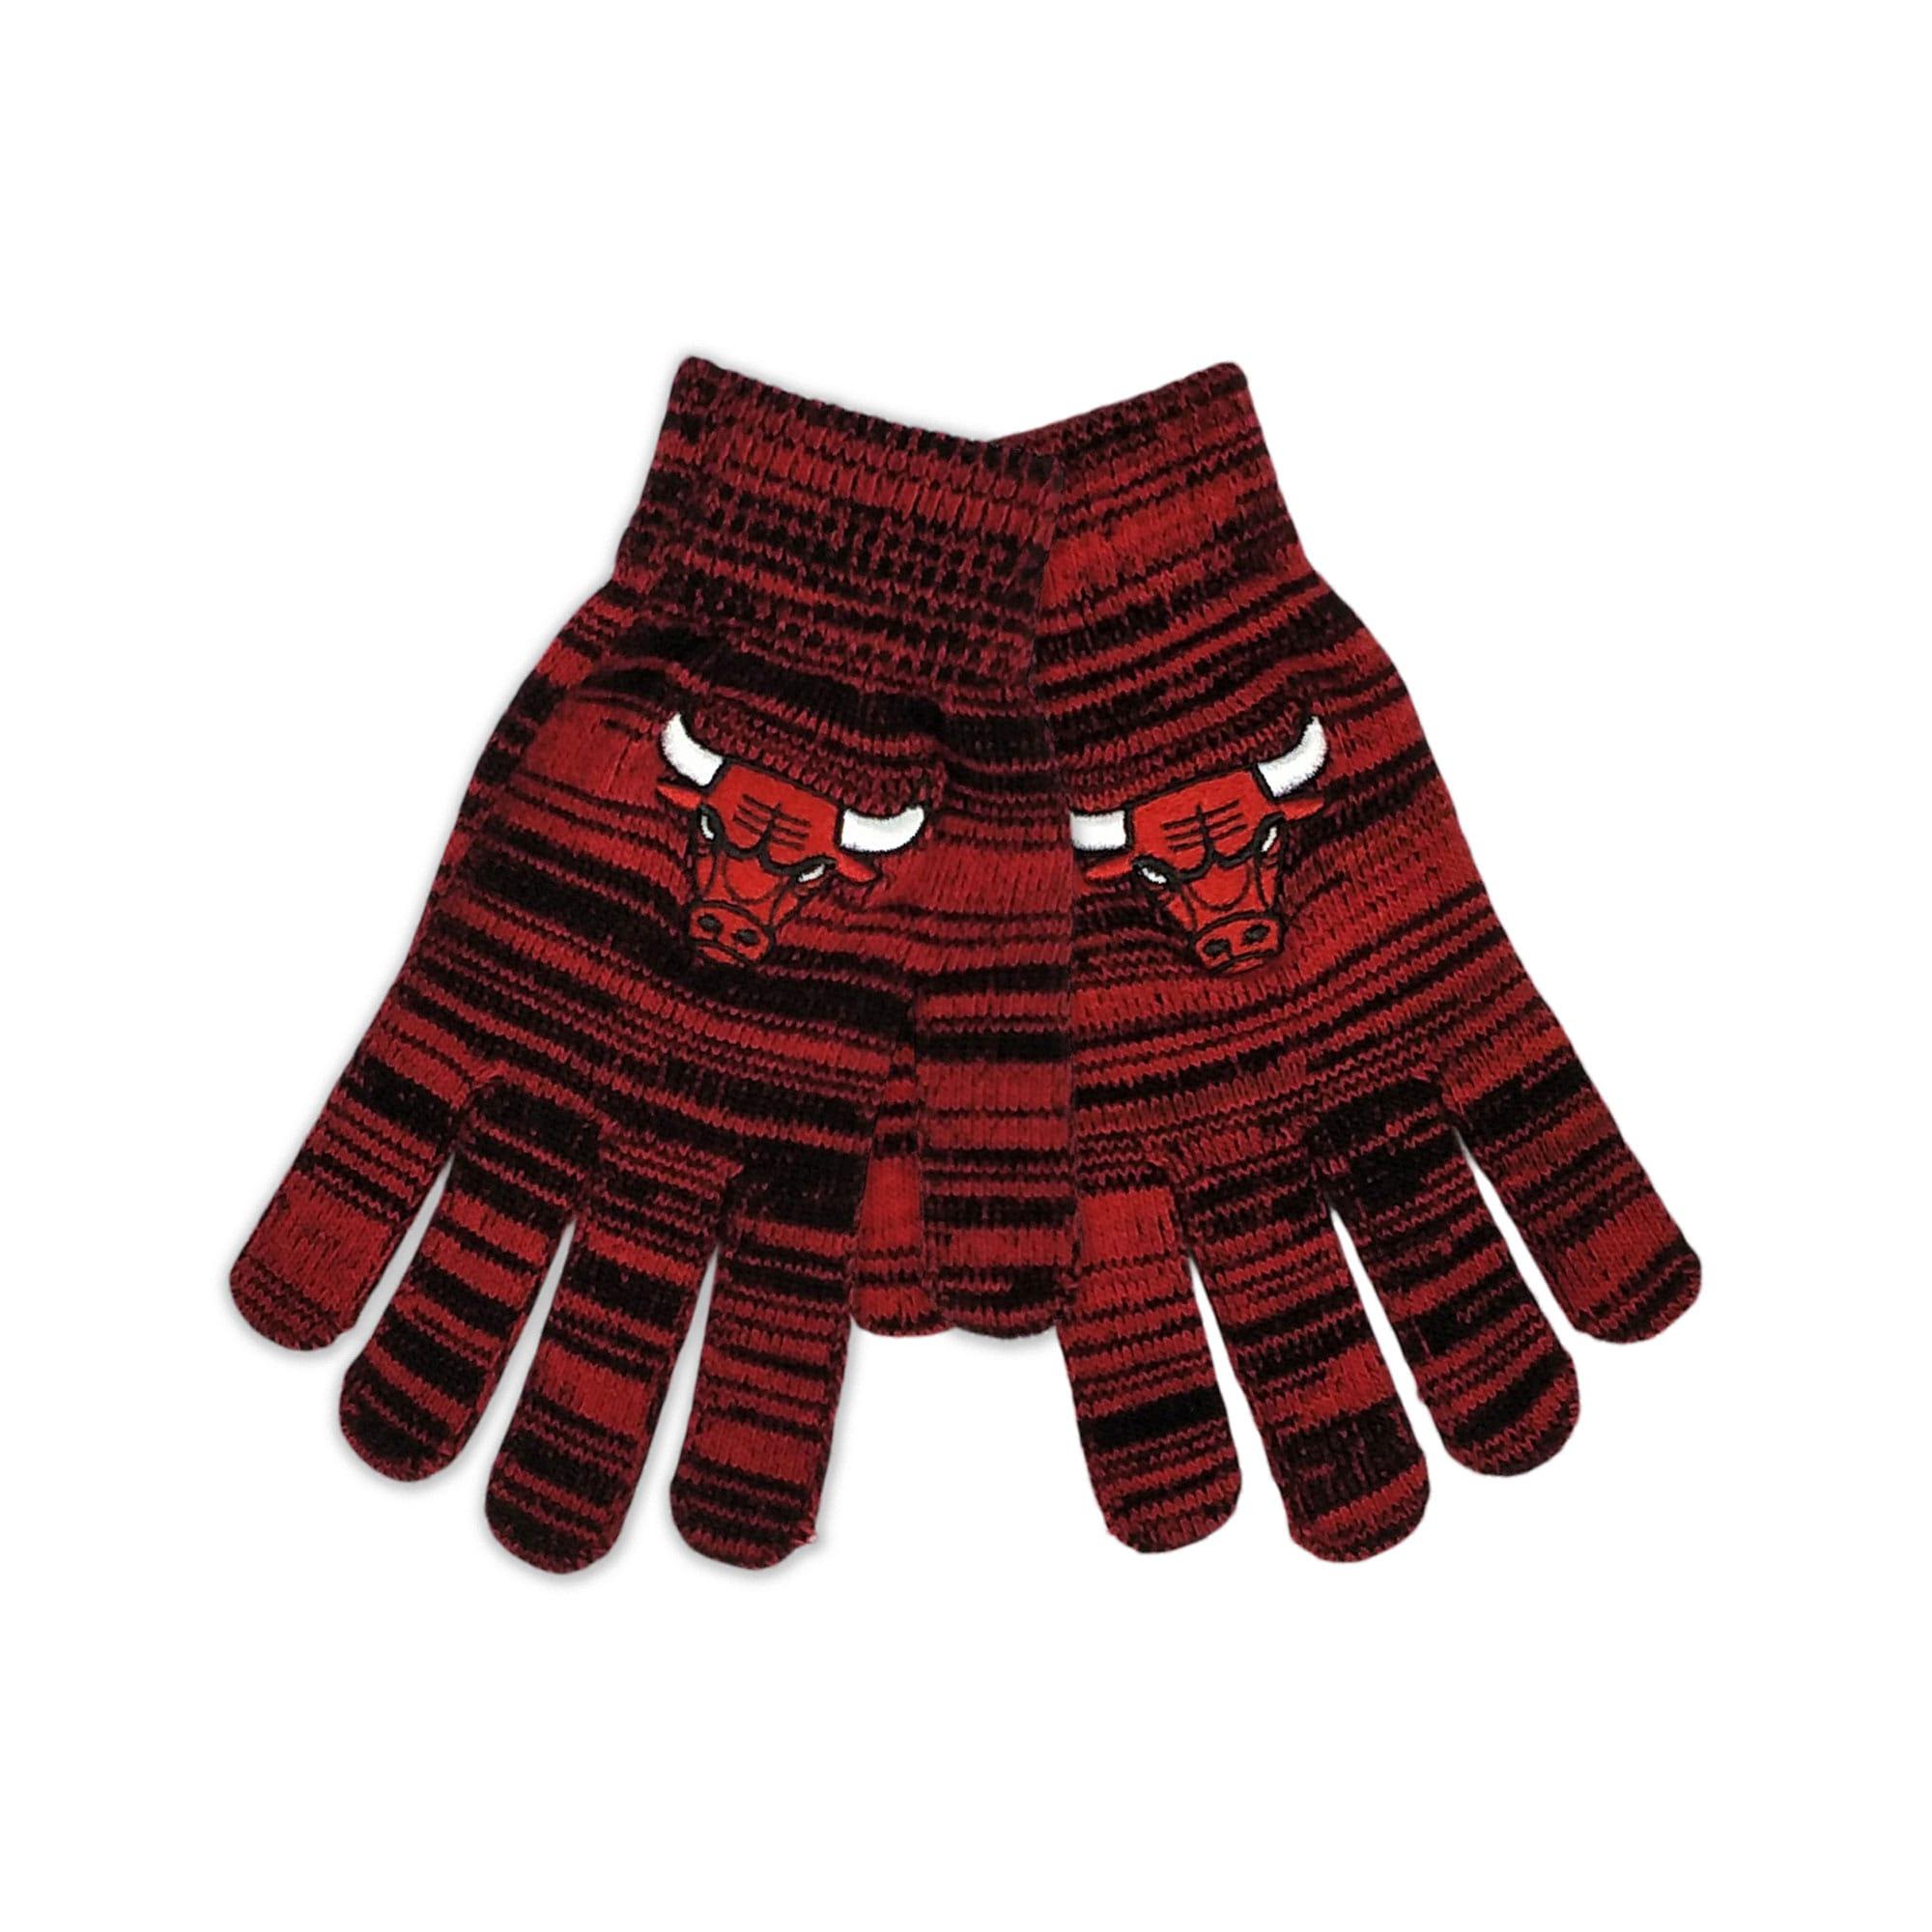 Chicago Bulls Colorblend Gloves